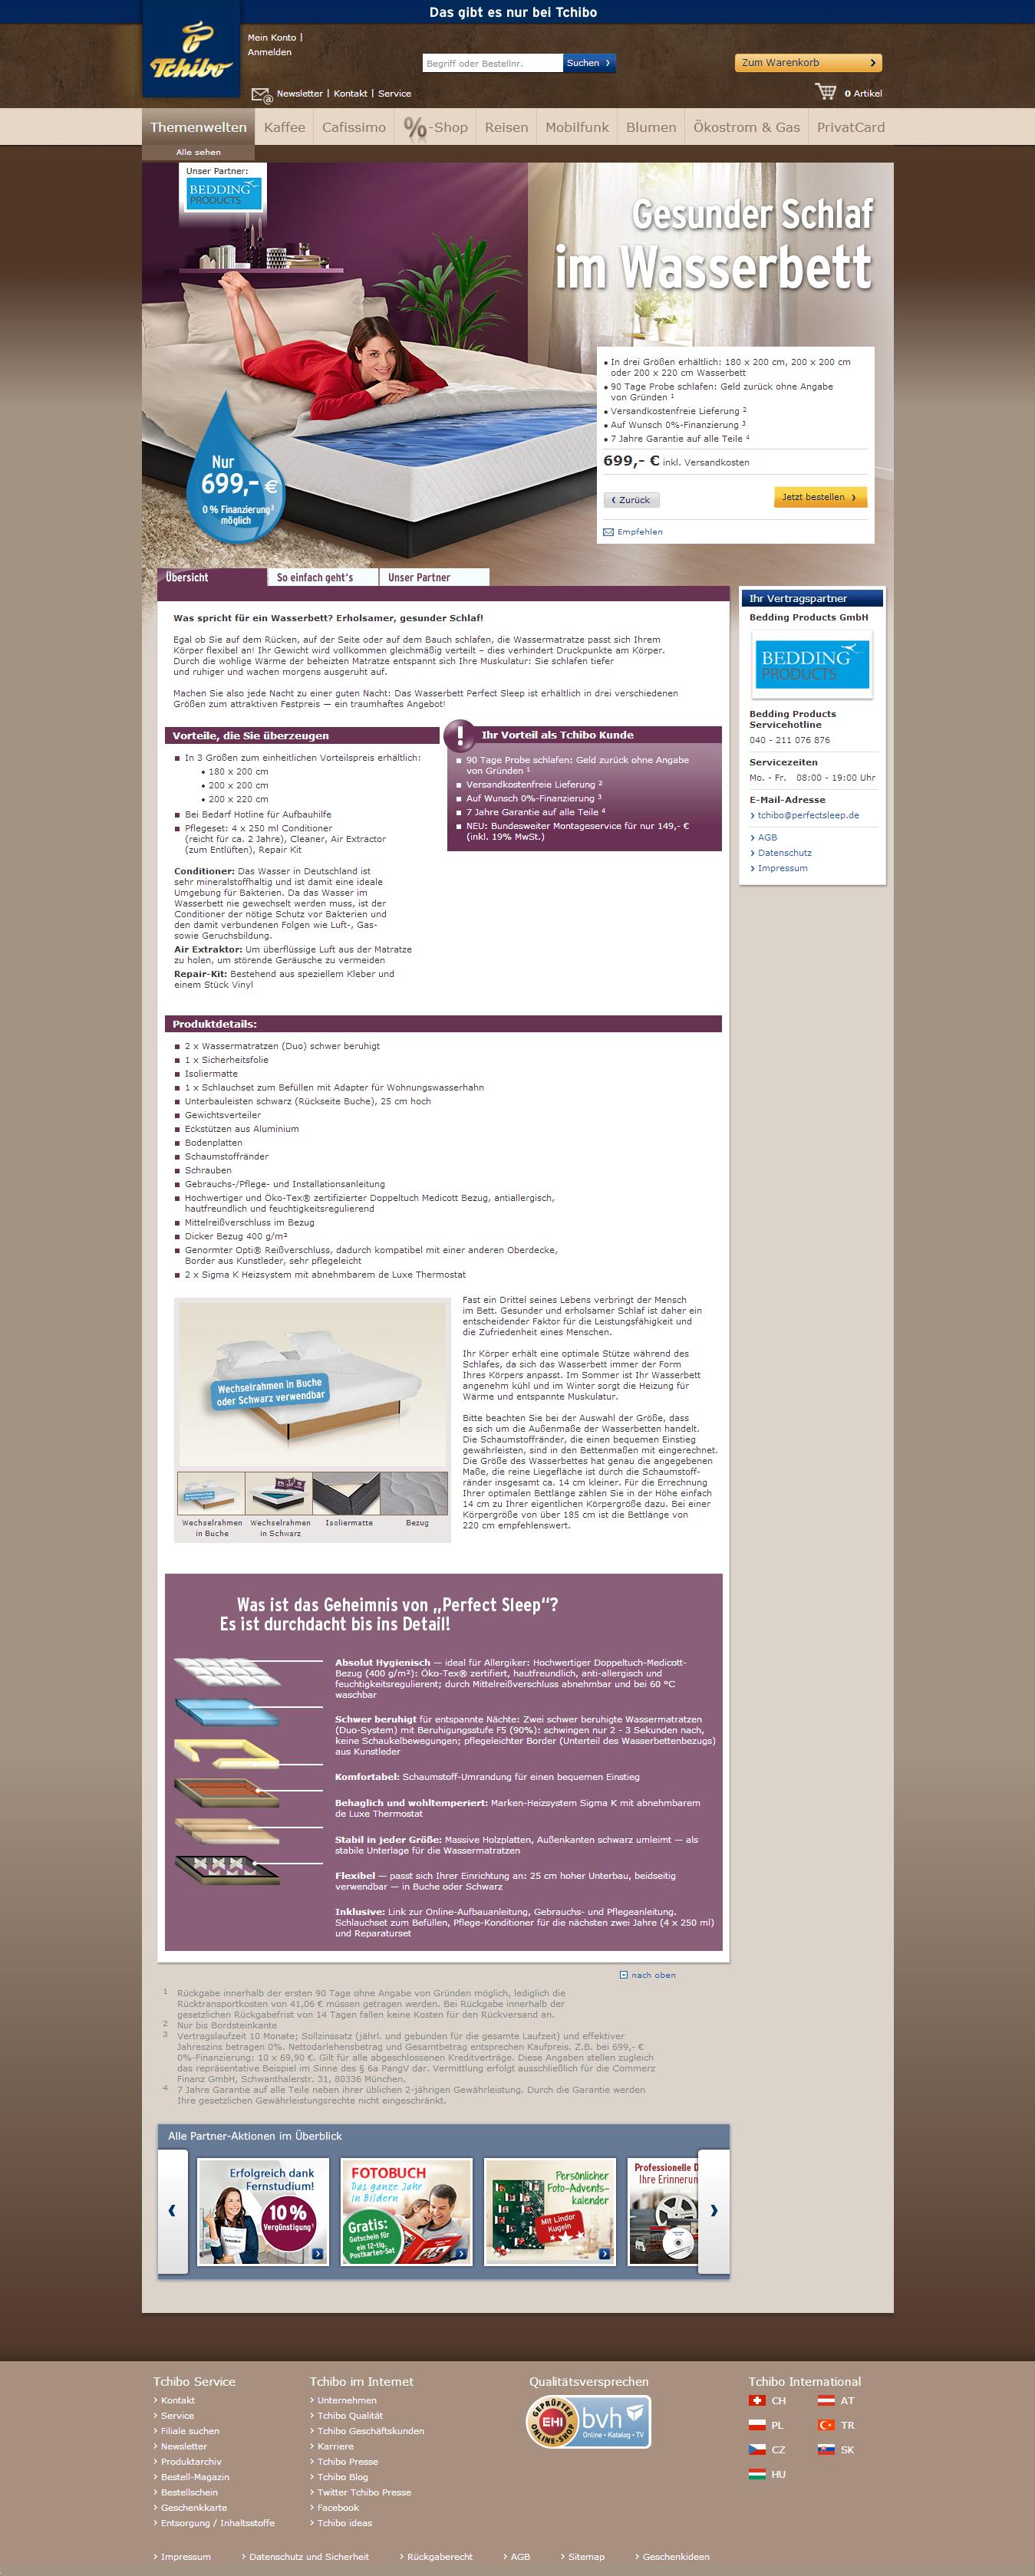 tchibo portfolio. Black Bedroom Furniture Sets. Home Design Ideas